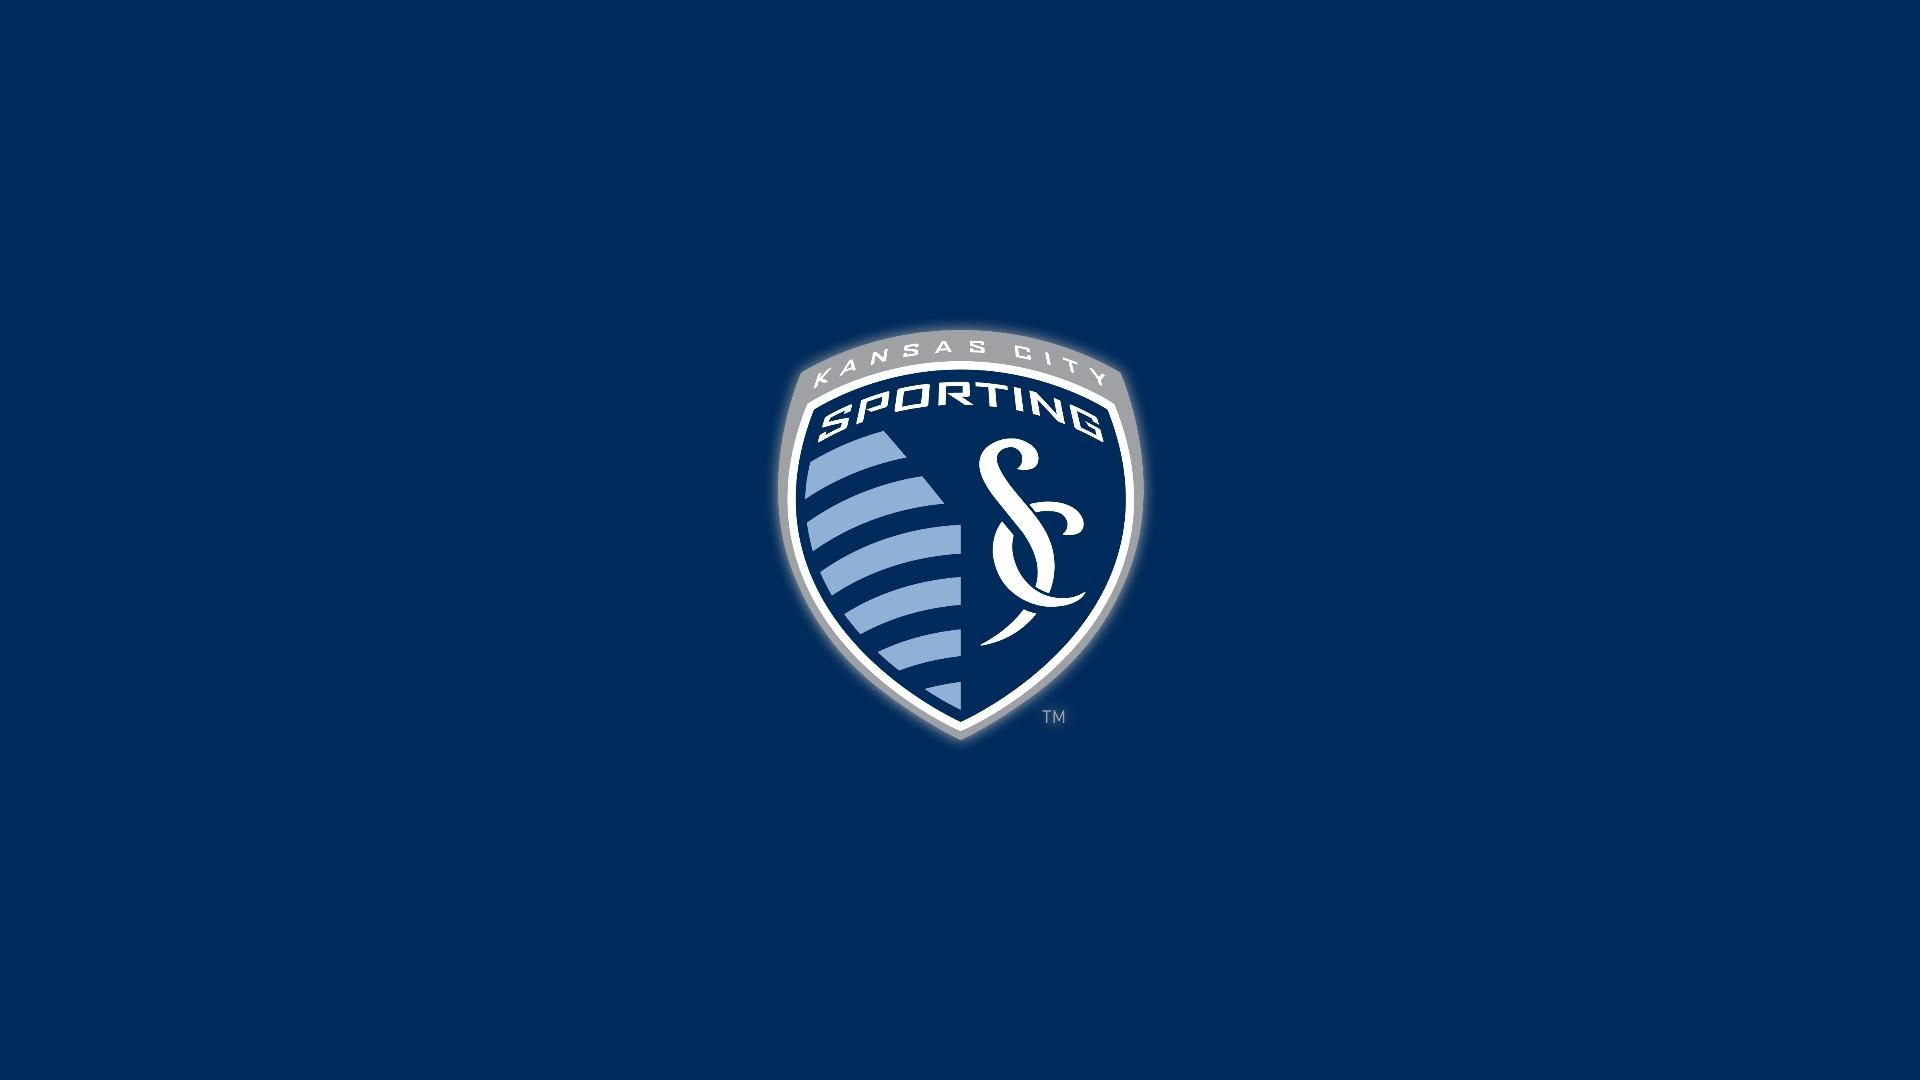 Sporting Kansas City Logo Wallpaper